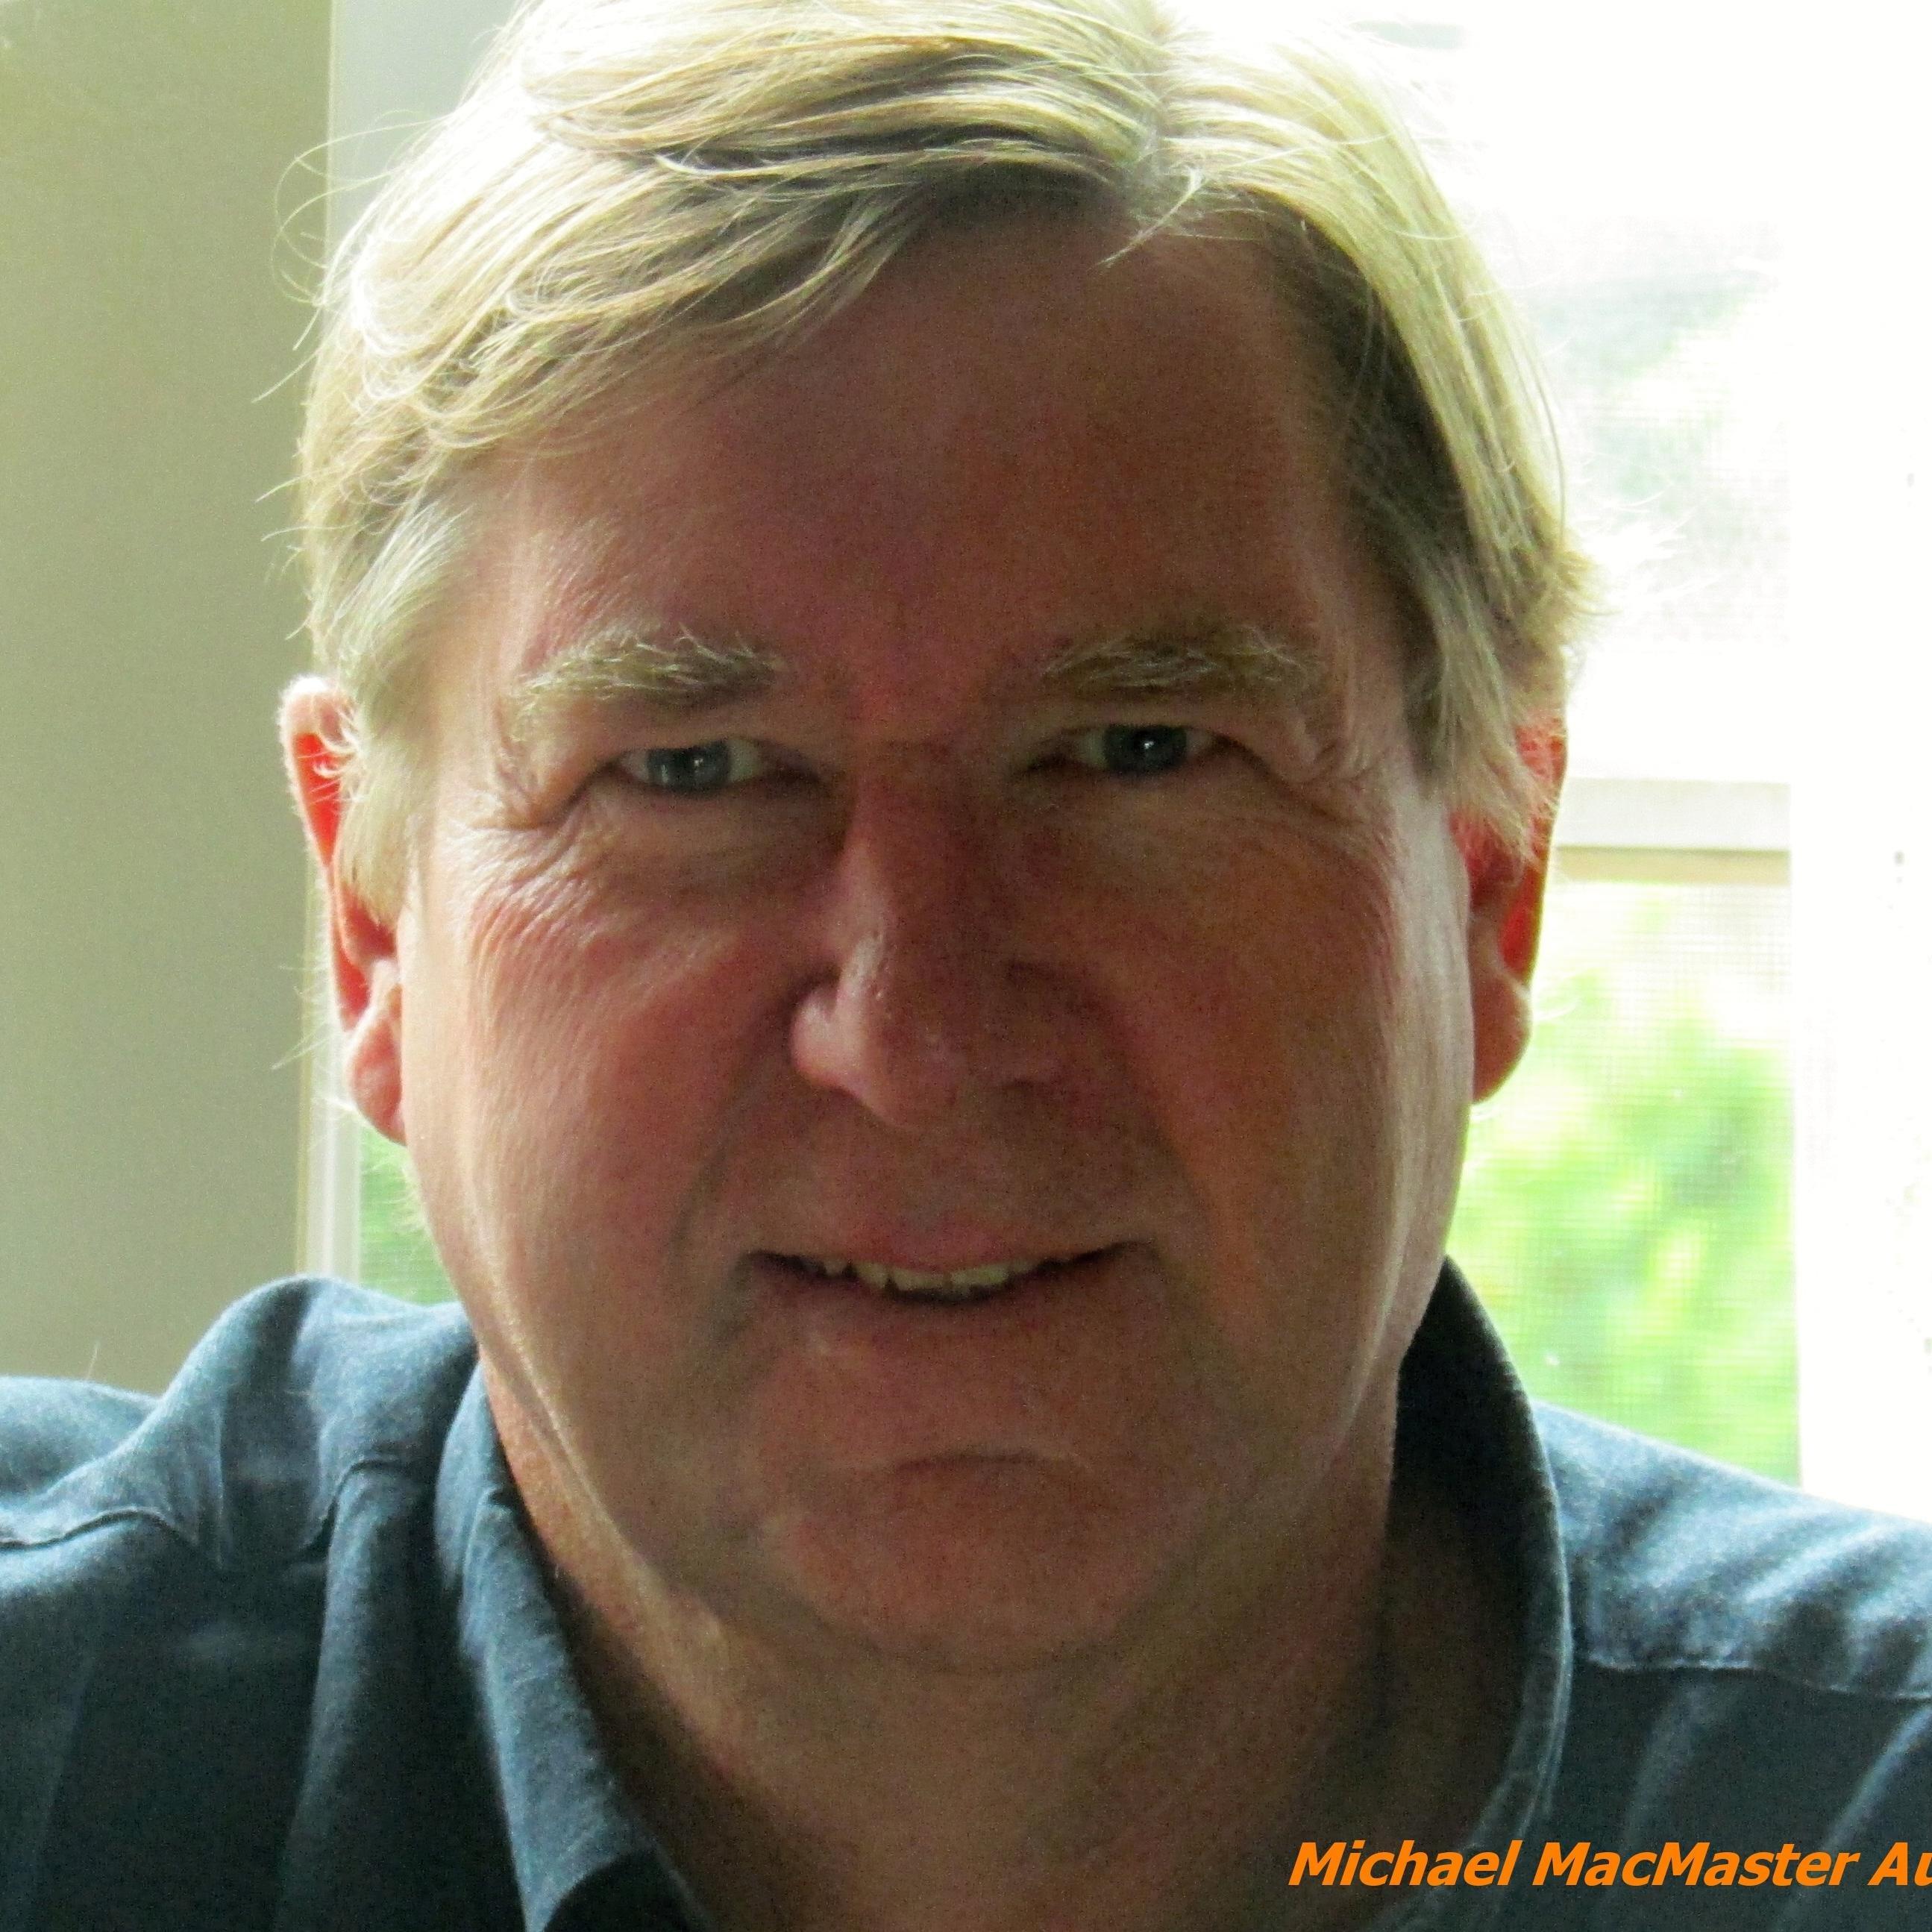 Michael MacMaster